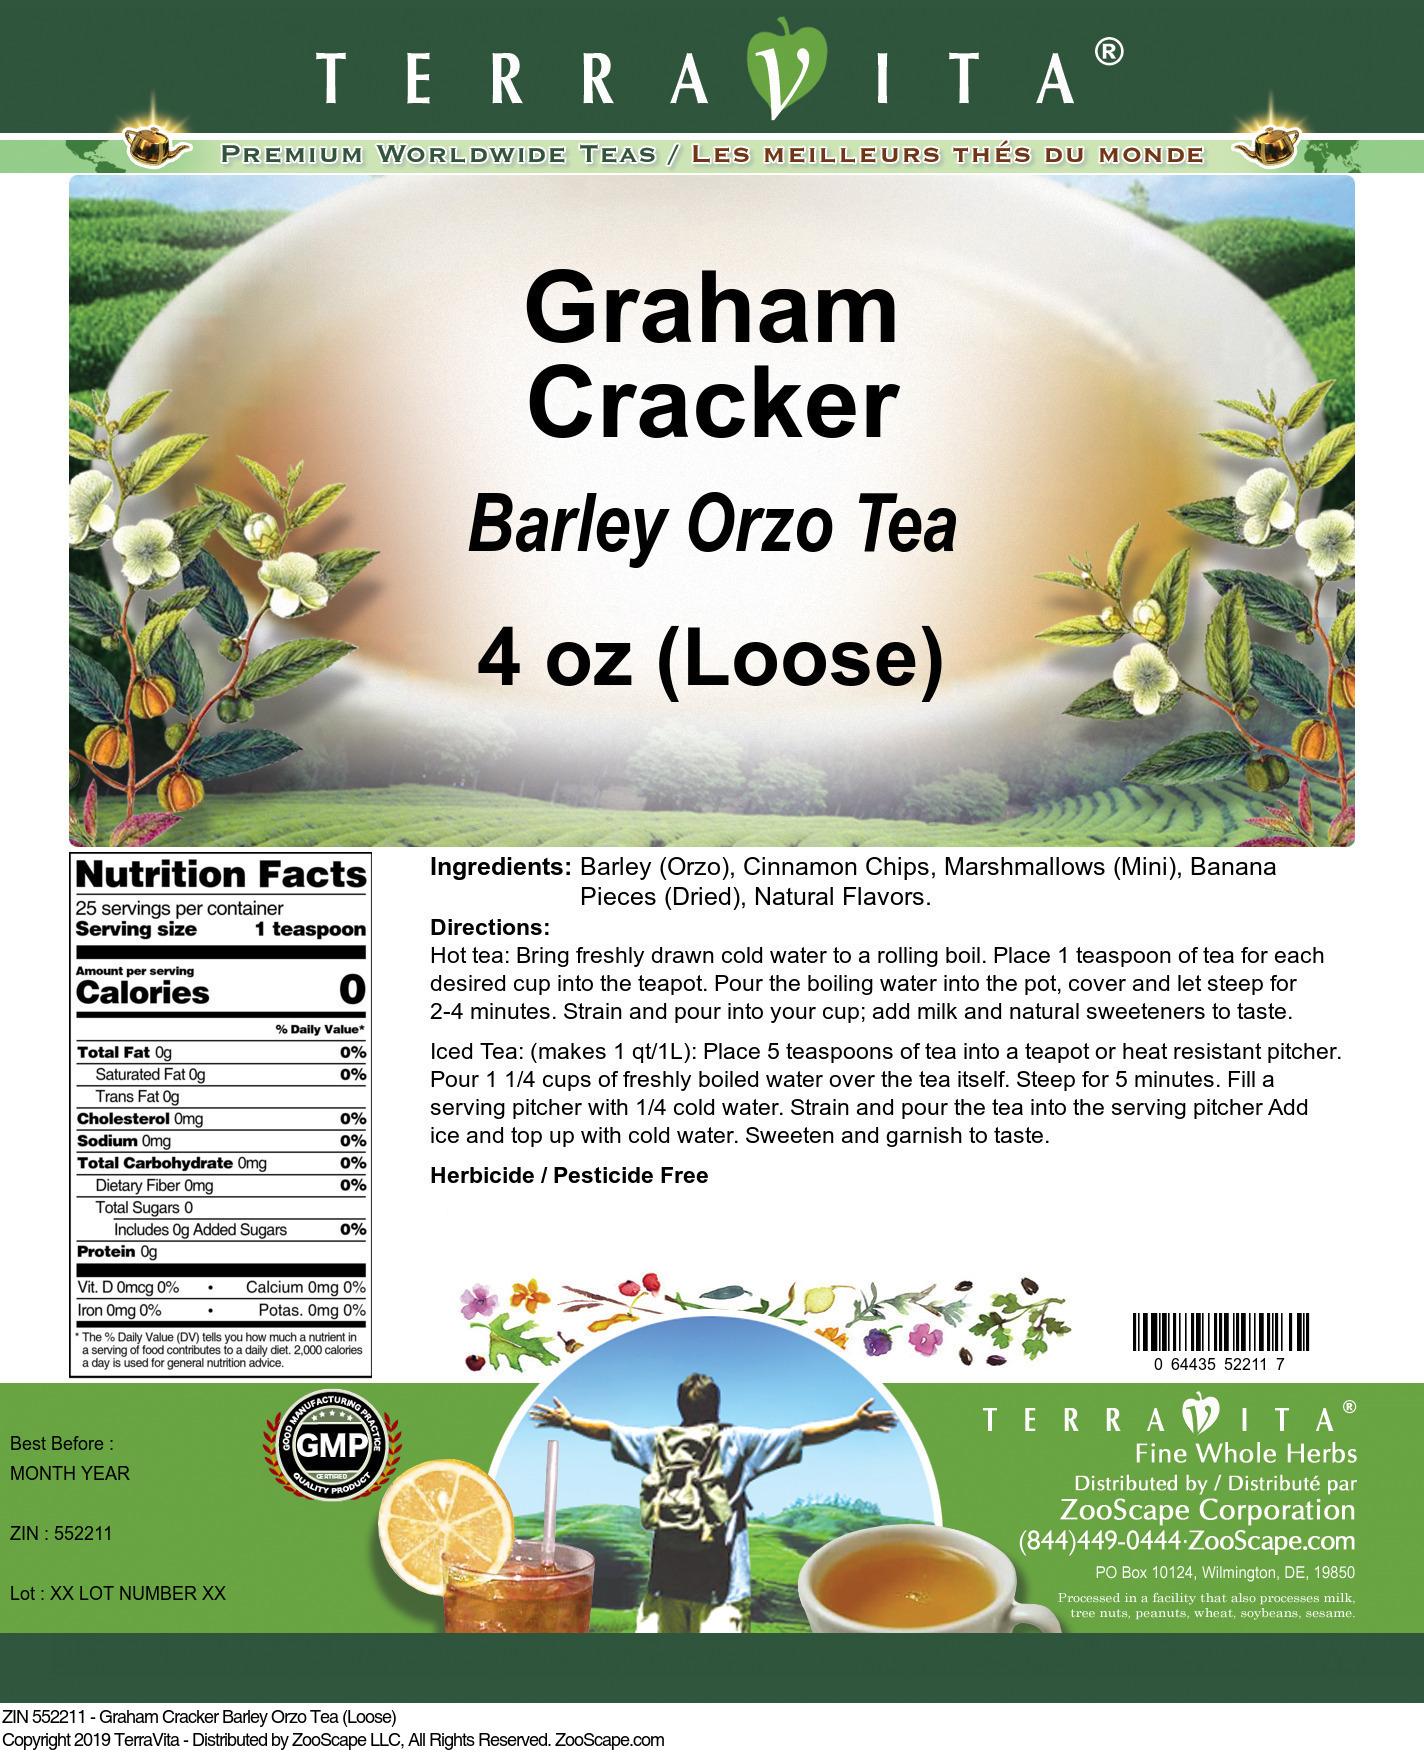 Graham Cracker Barley Orzo Tea (Loose)